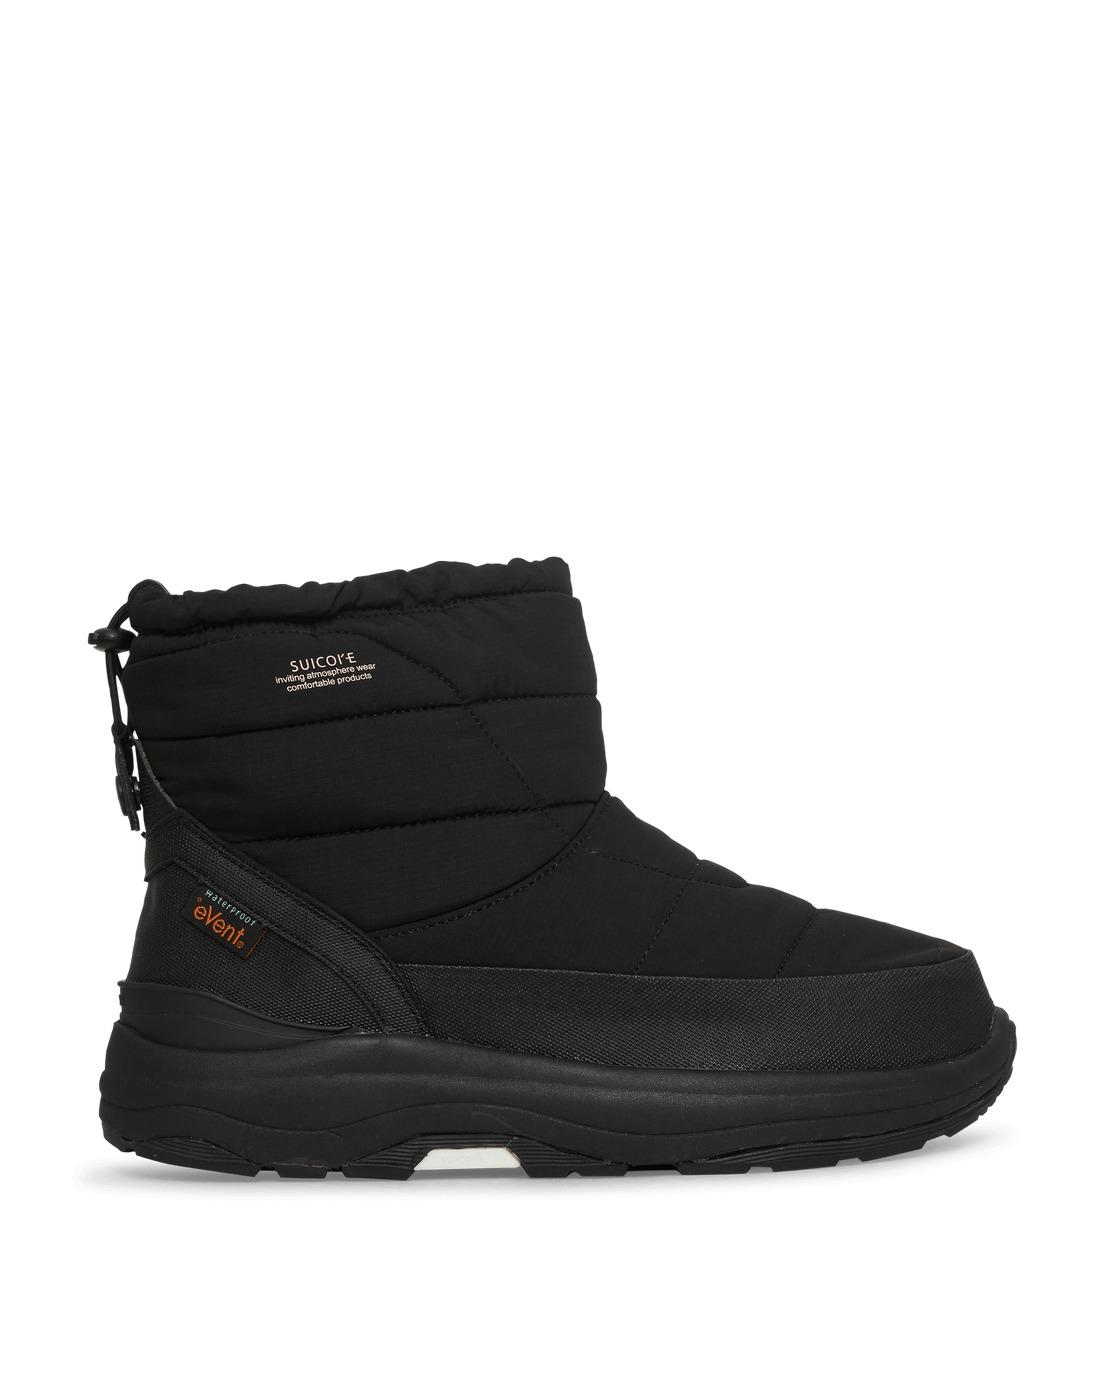 Photo: Suicoke Bower Evab Boots Black